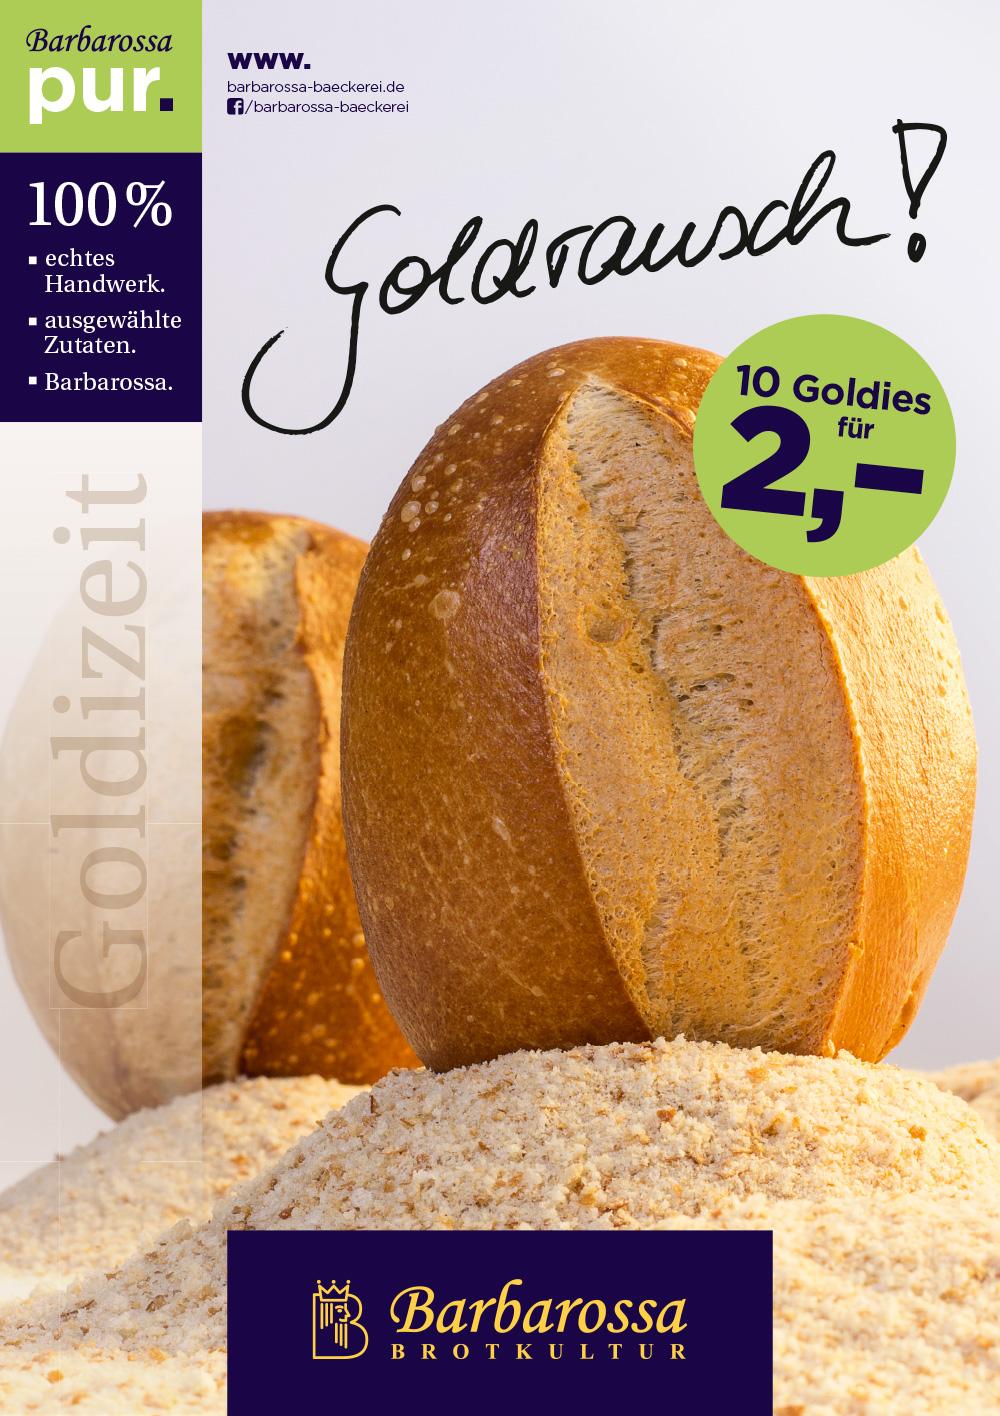 Kampagne Barbarossa Bächerei Goldrausch